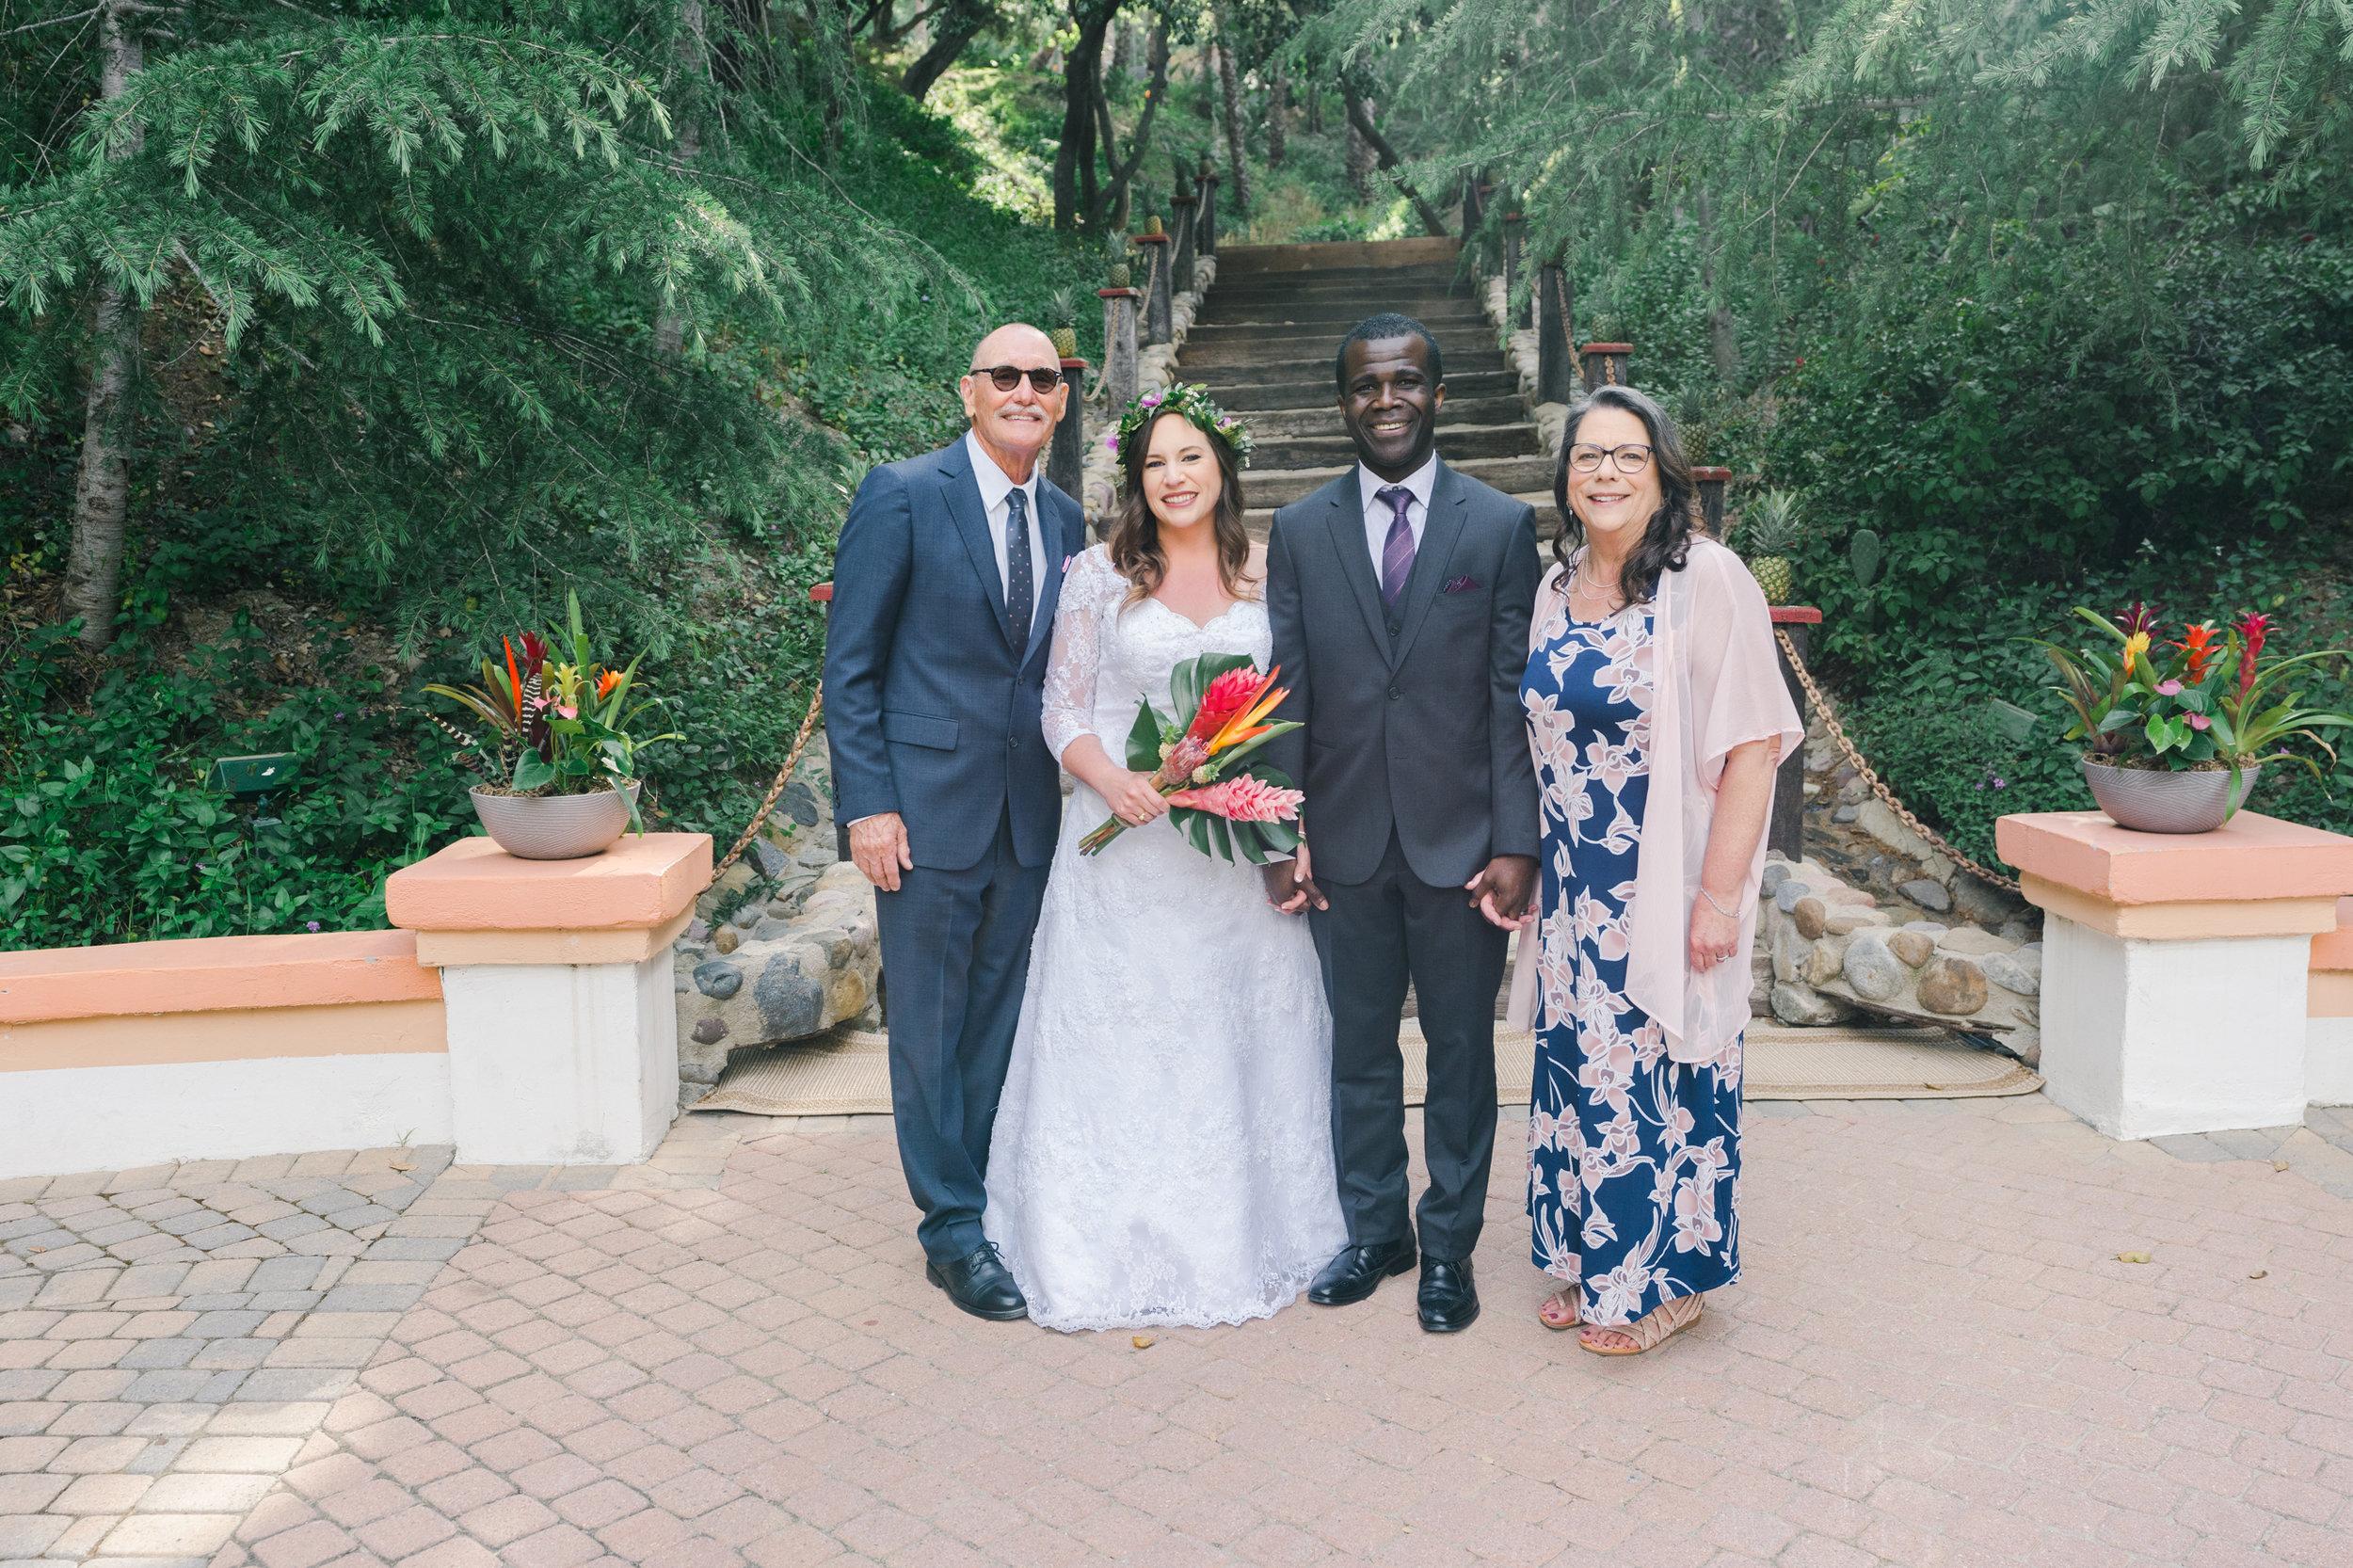 rancho-las-lomas-wedding-kelsey-sim_0145.JPG